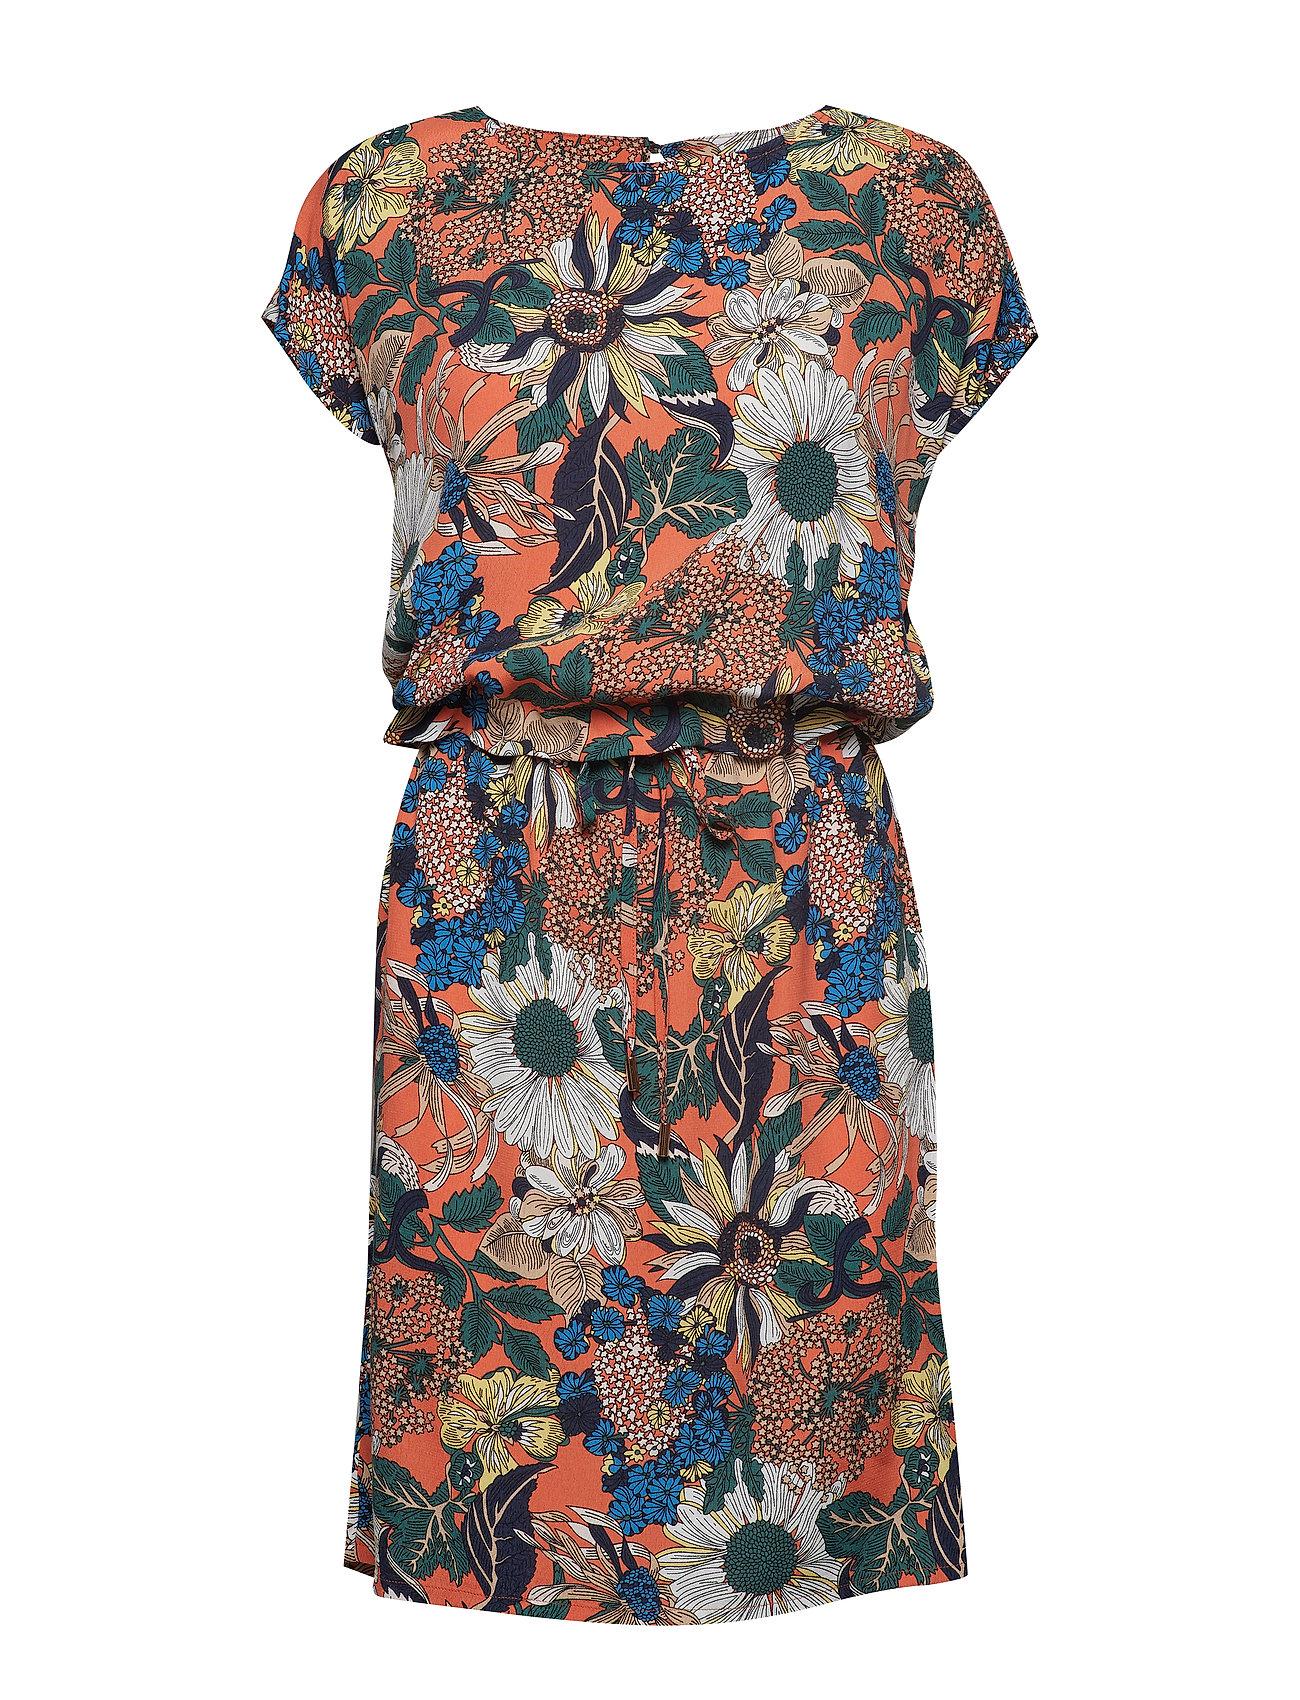 Minus Freya dress - PUMPKIN PRINT